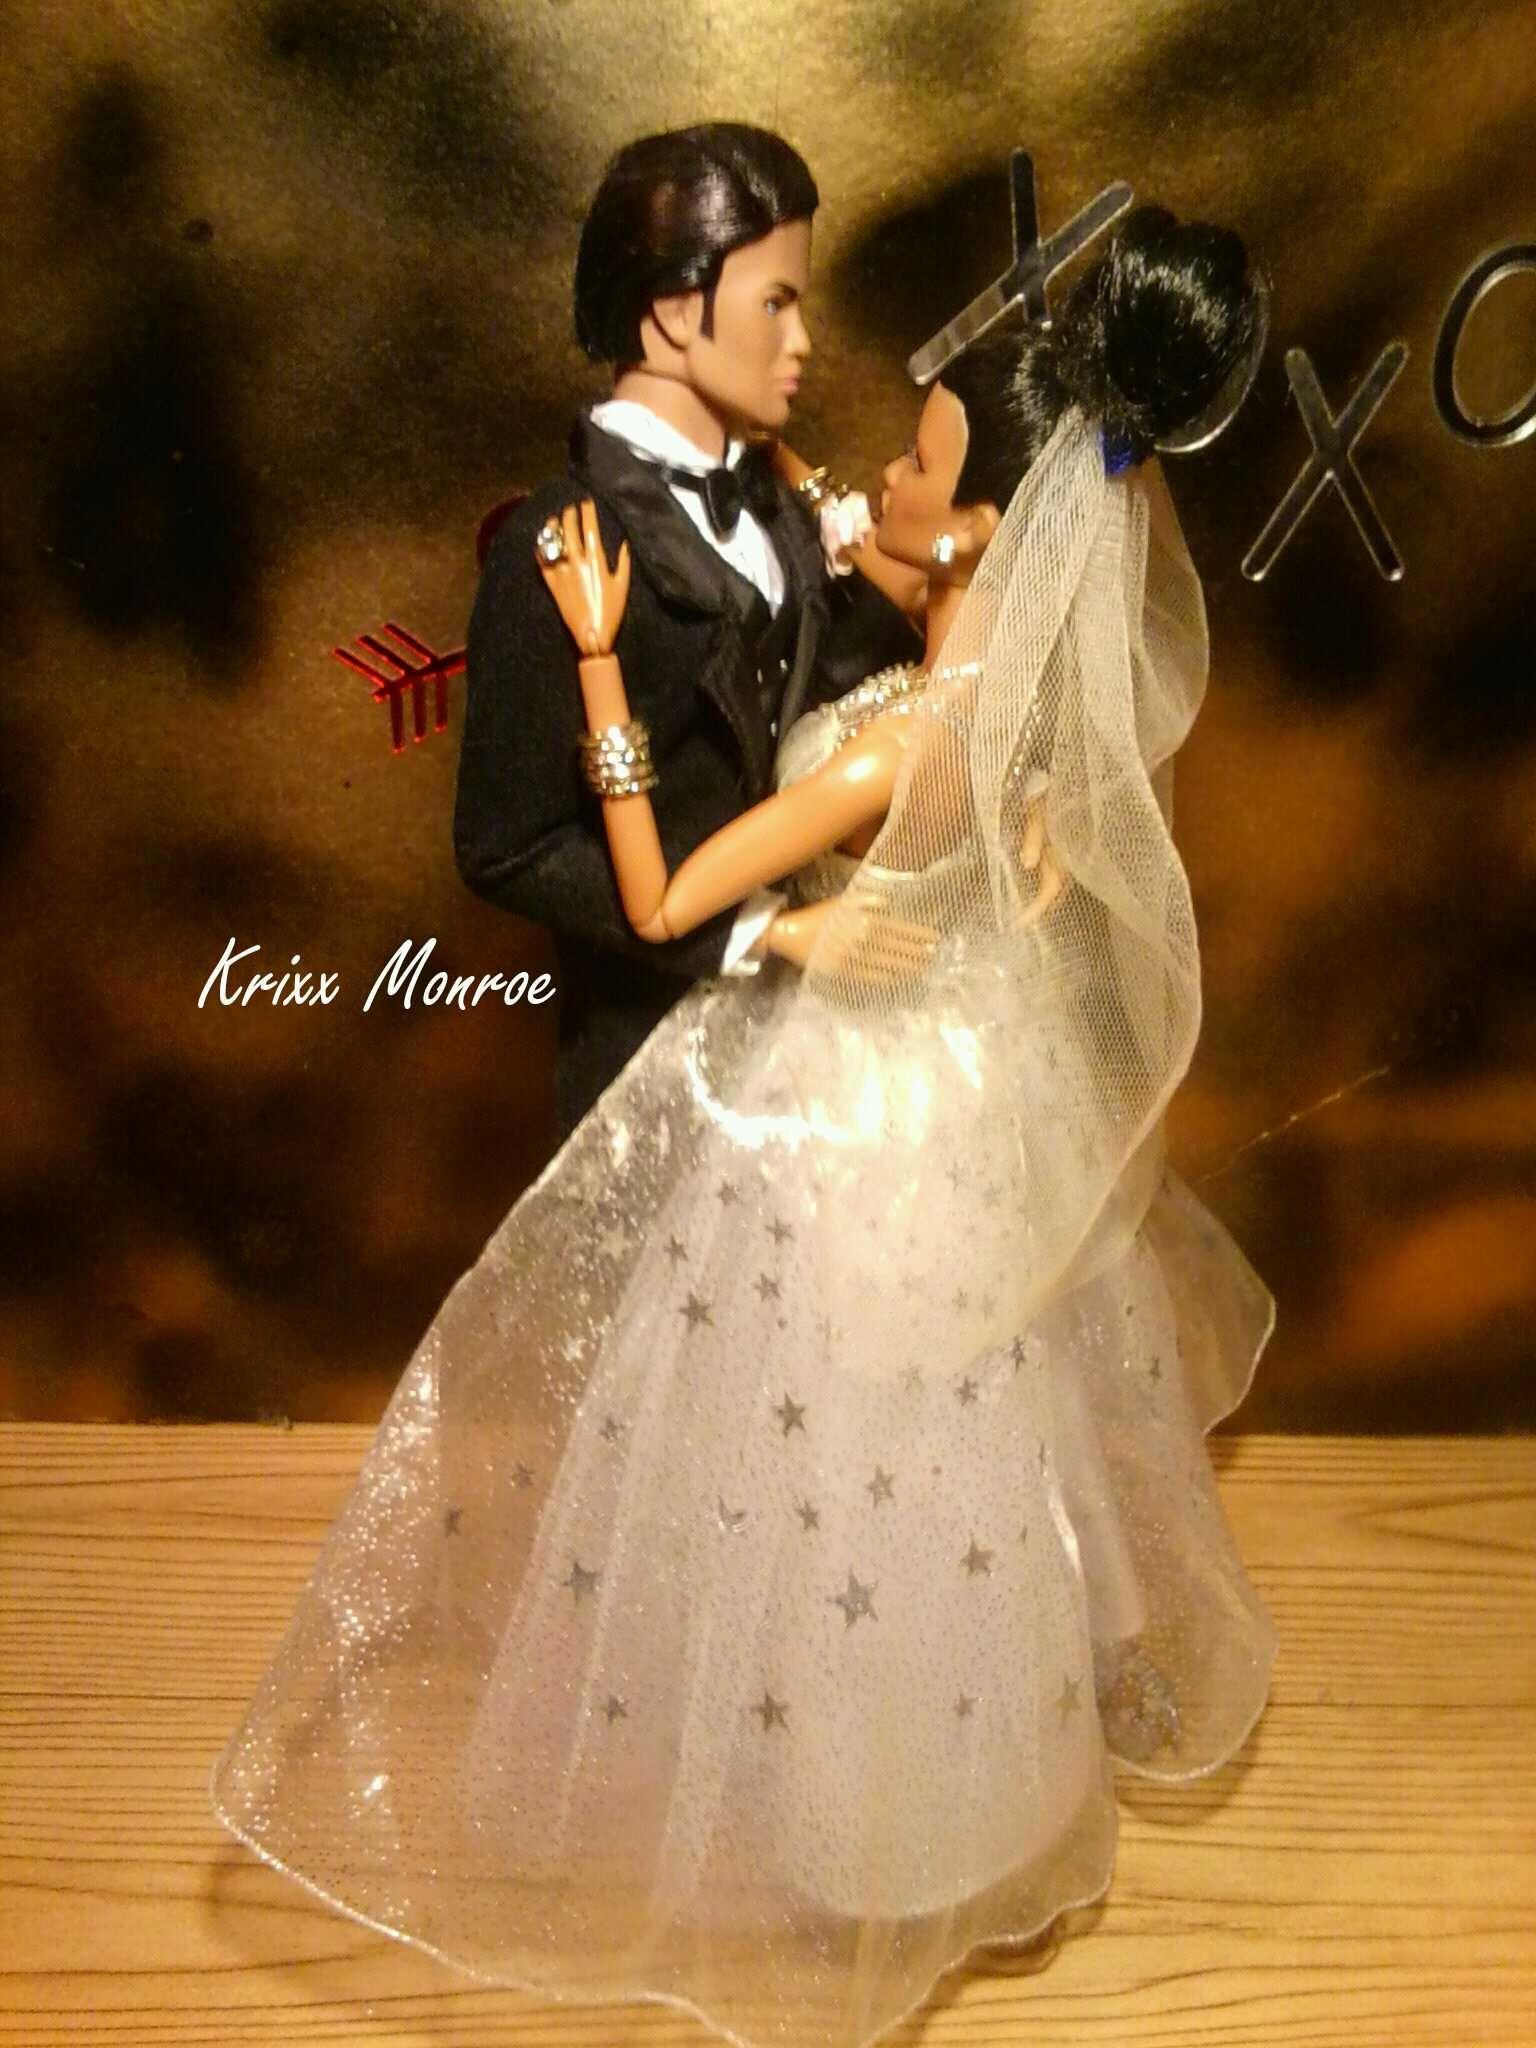 Doll wedding dress  Damon u Dominique wedding Krixxx Monroe flickr   qw  Barbie